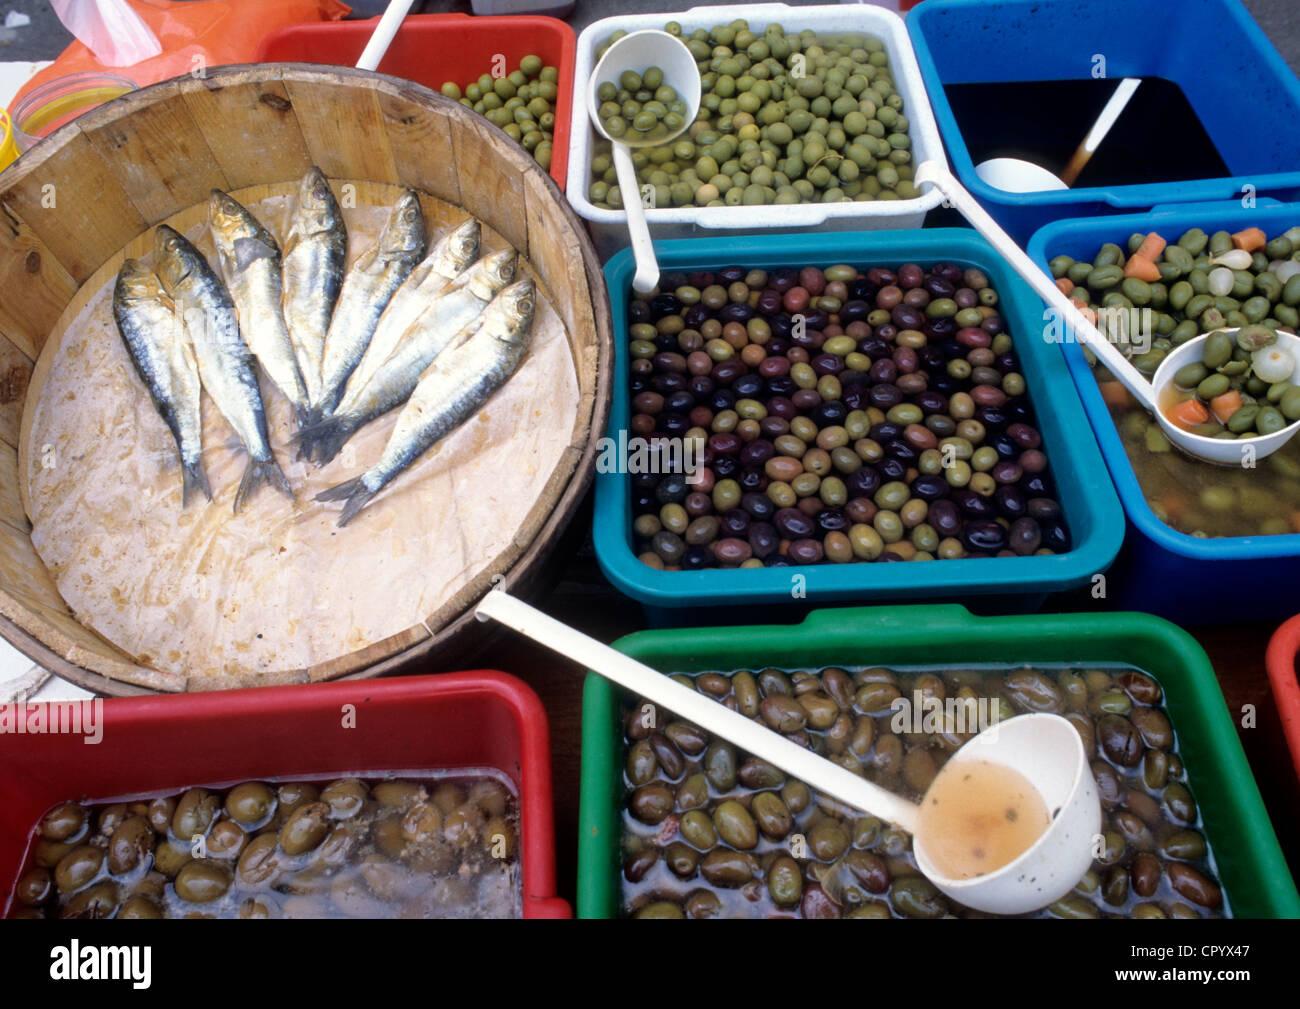 Spain, Catalonia, Barcelona, Las Ramblas, Boqueria Market - Stock Image